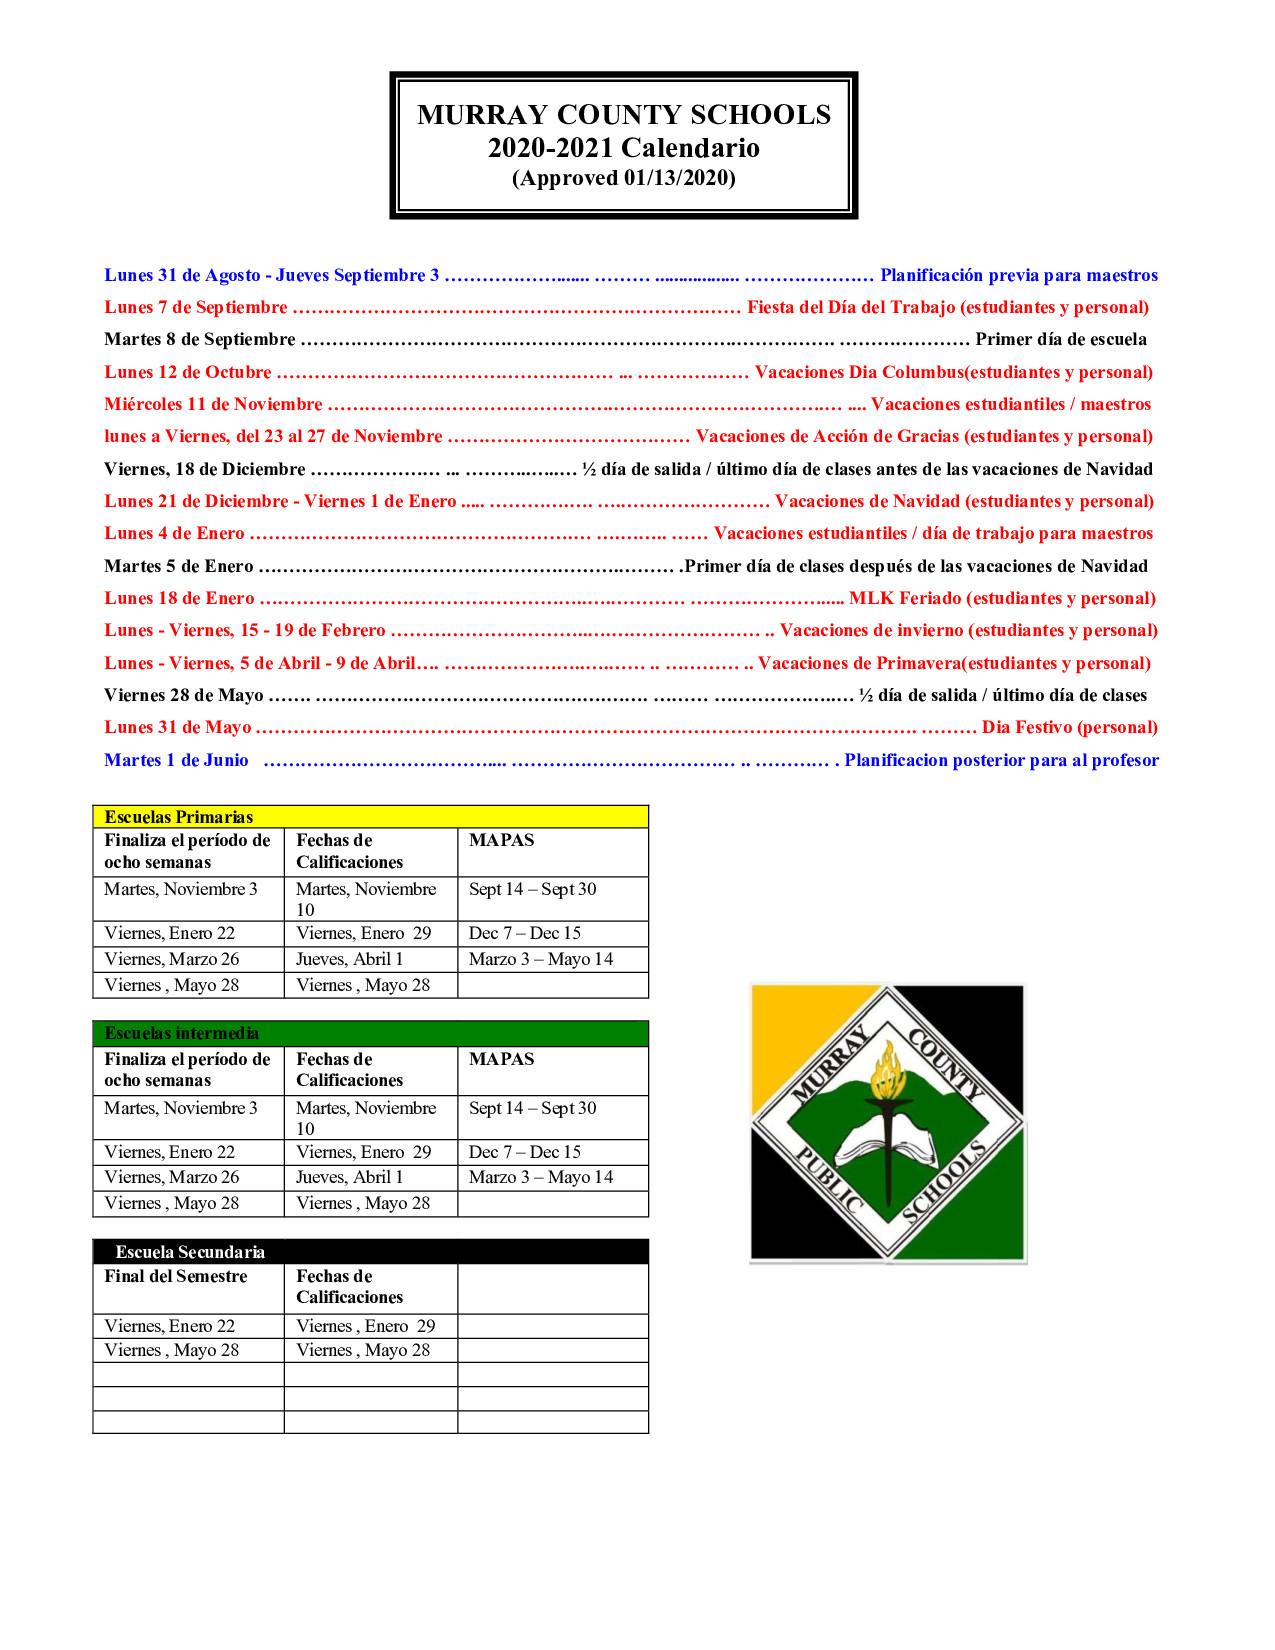 Murray County Schools Calendar- Spanish